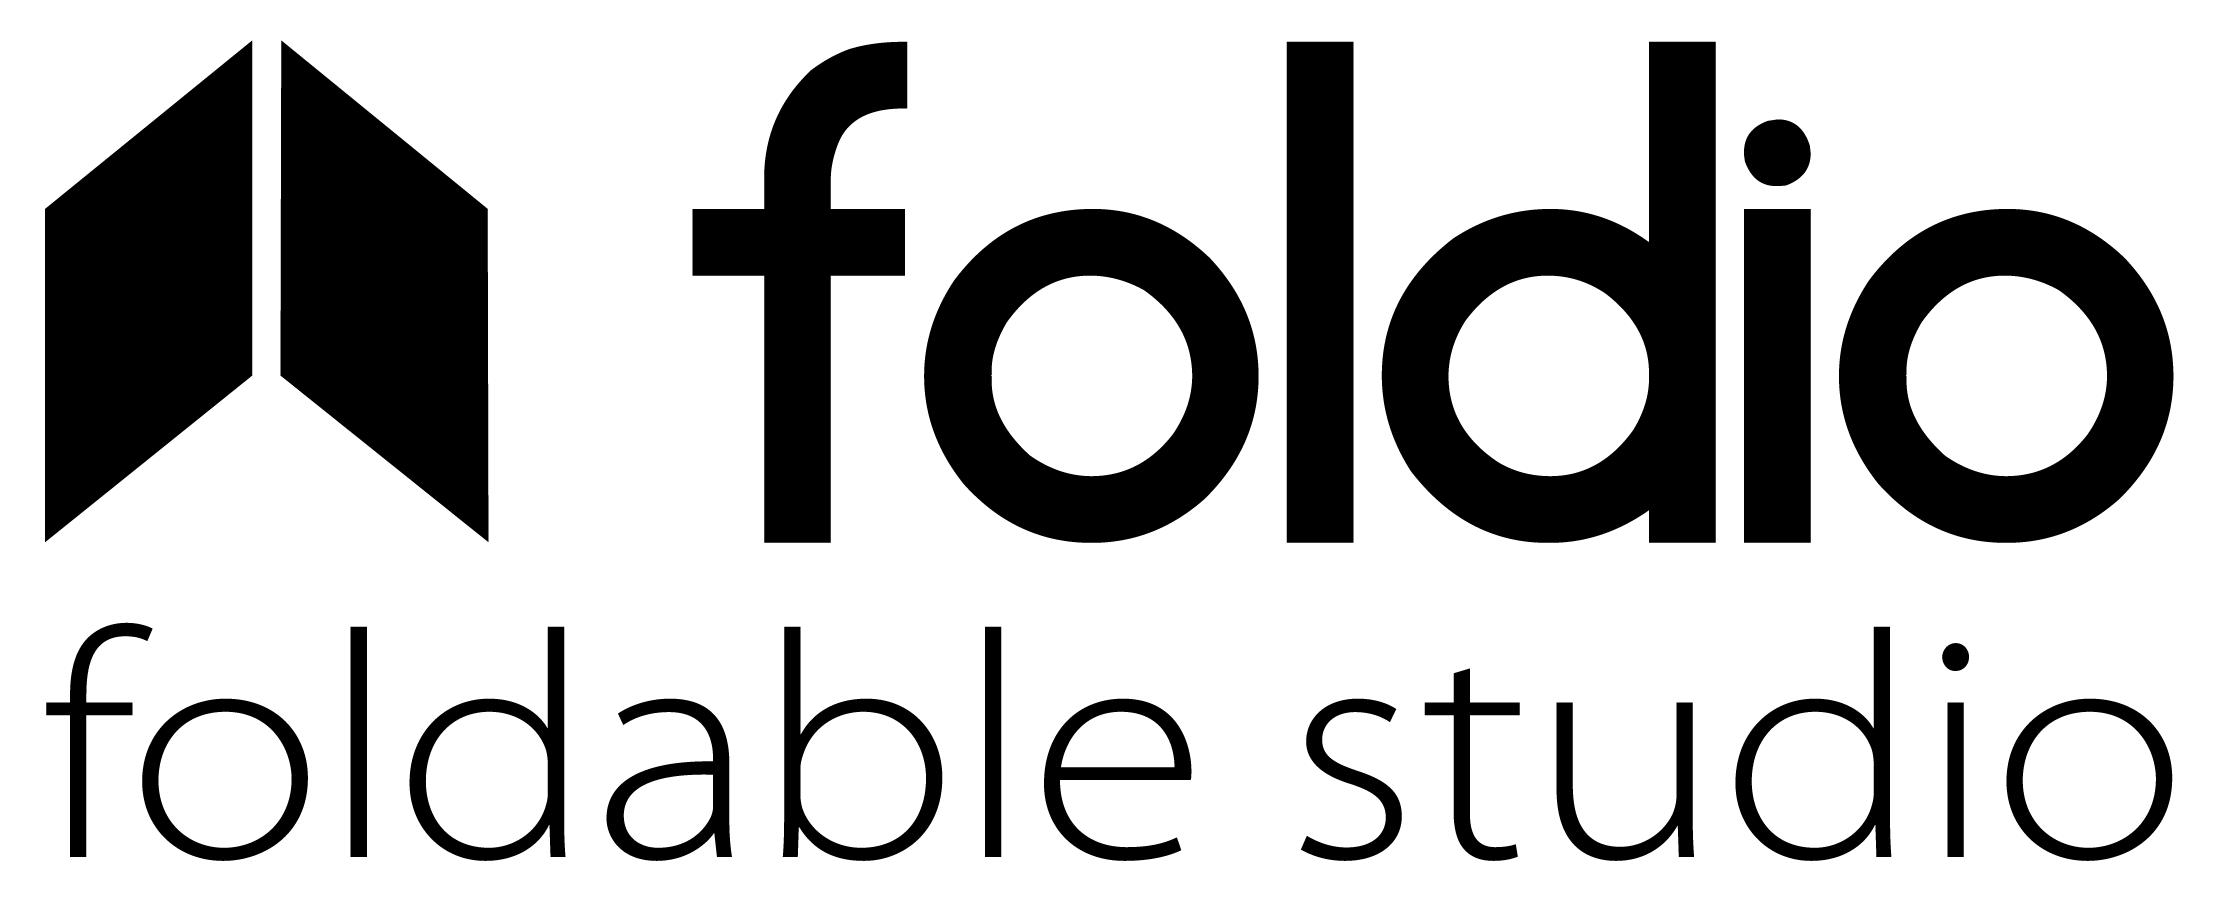 foldio.ro